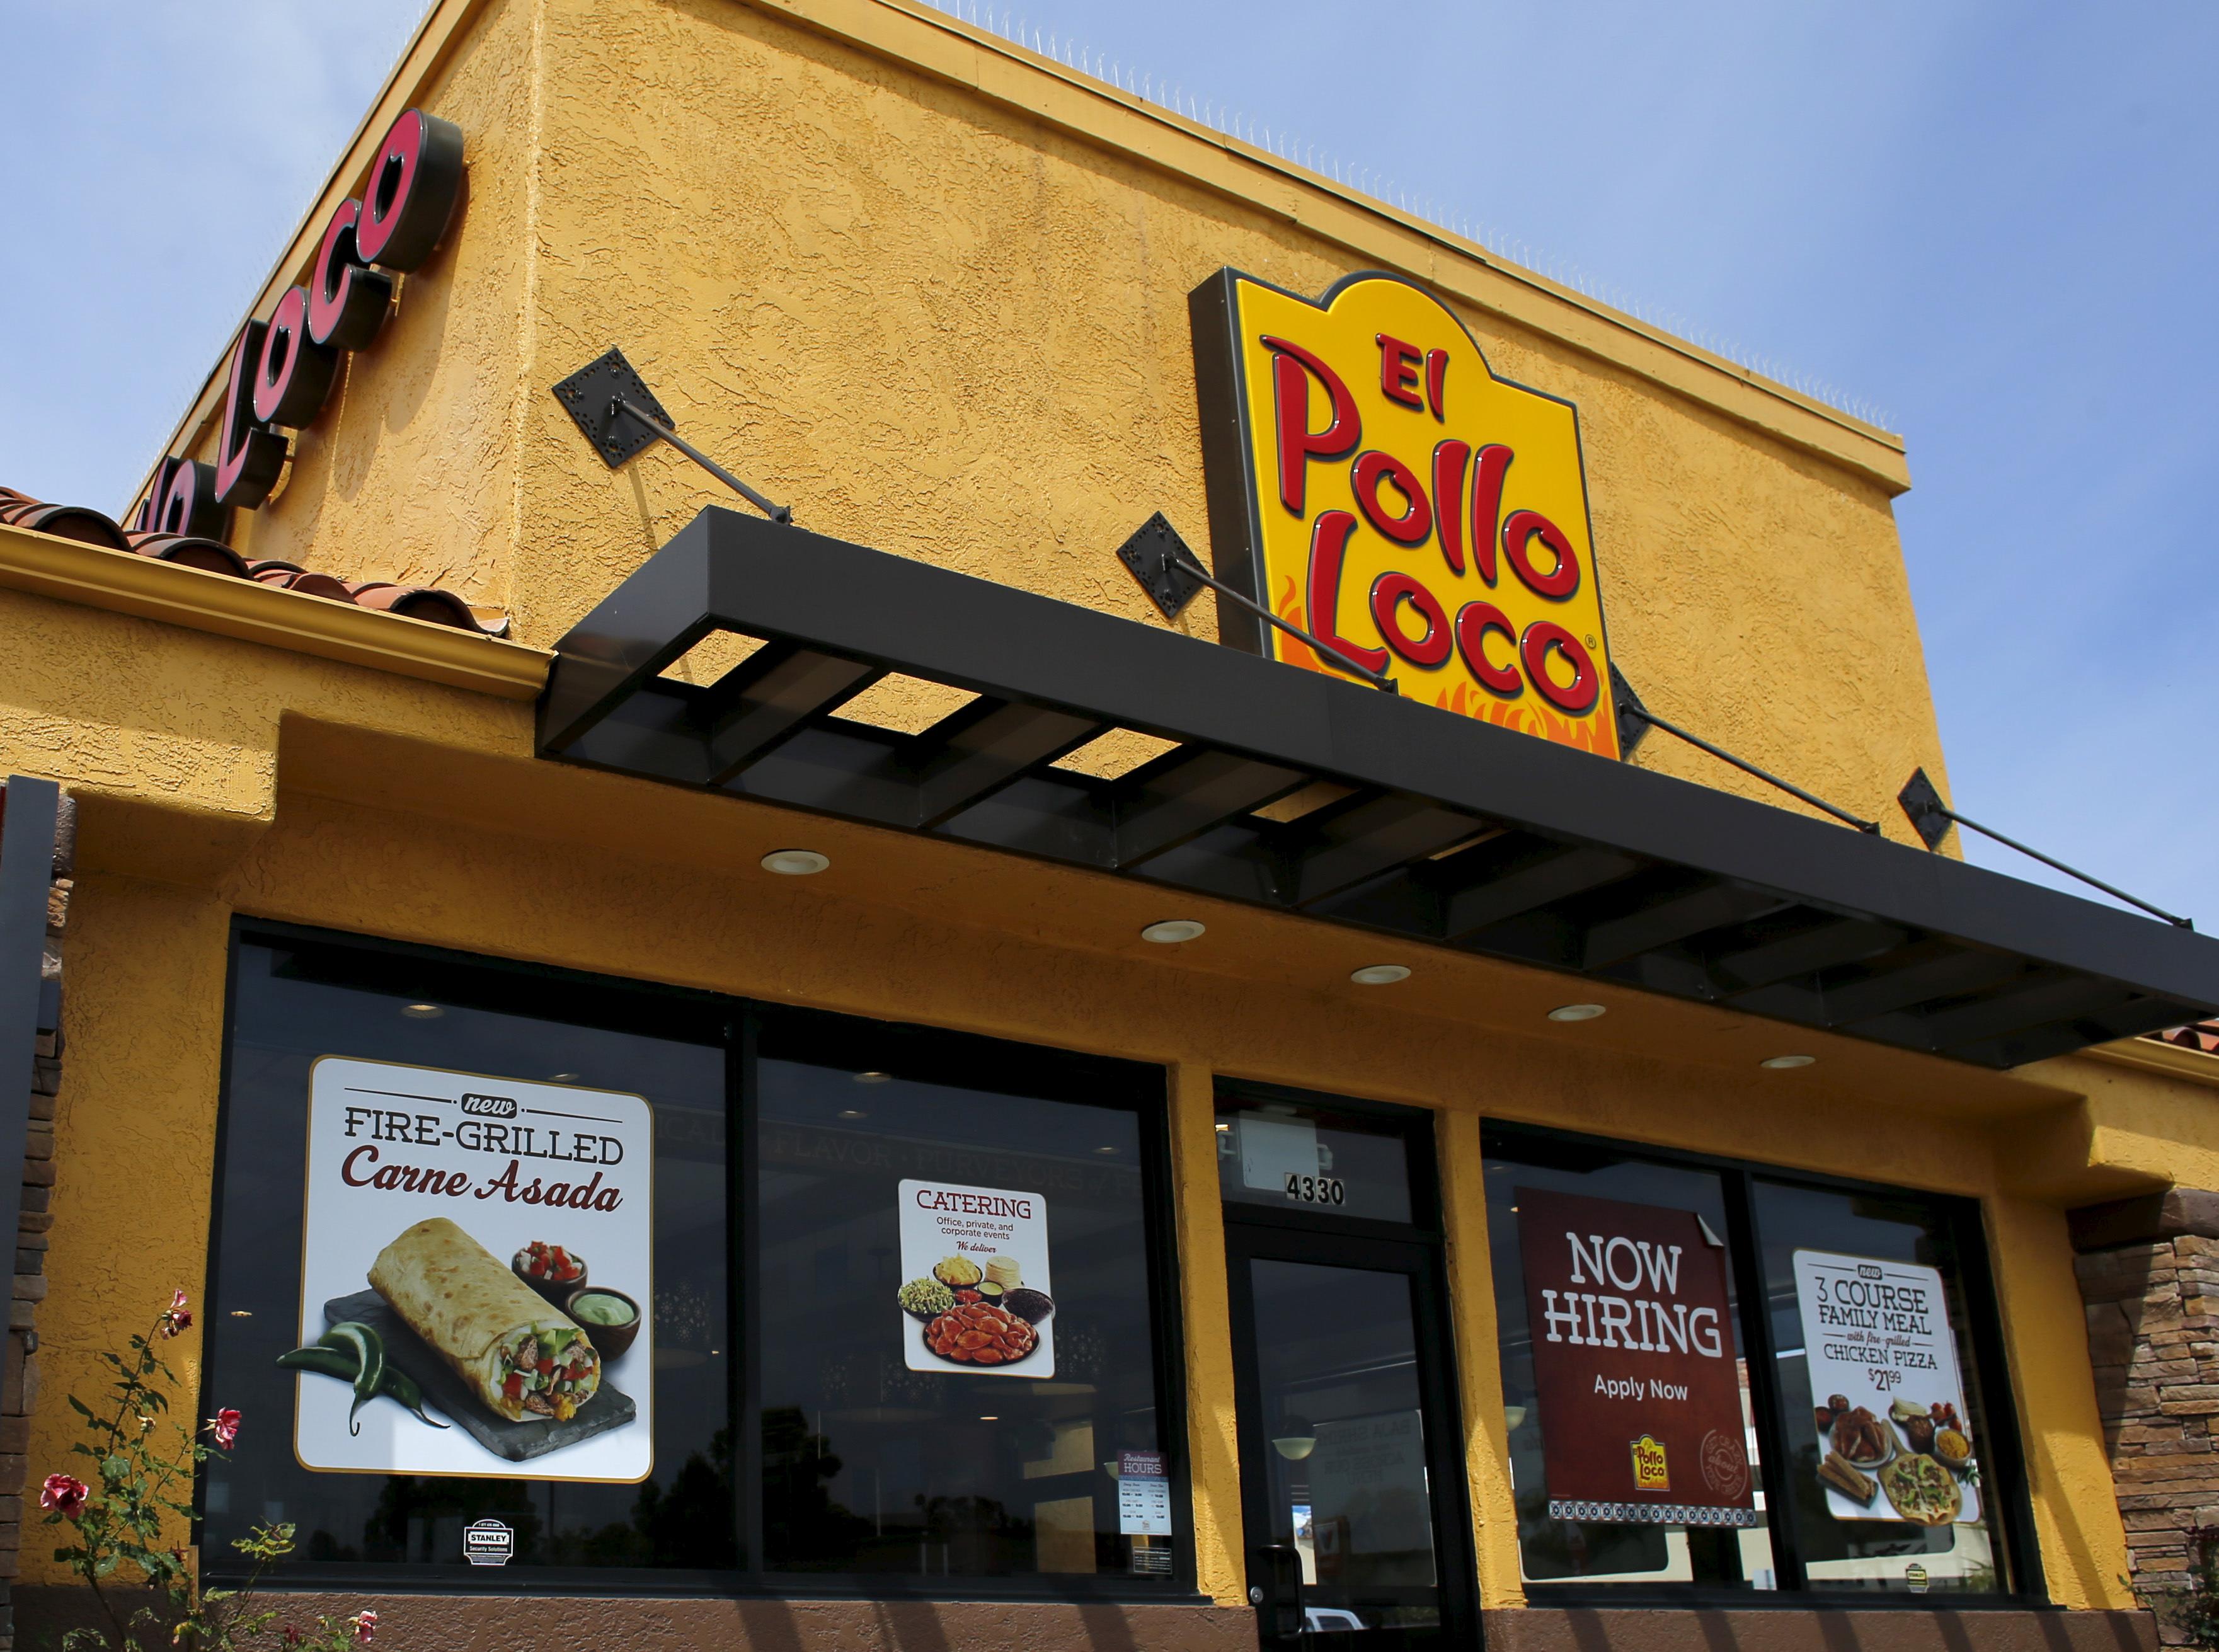 An El Pollo Loco restaurant is shown in San Diego, California